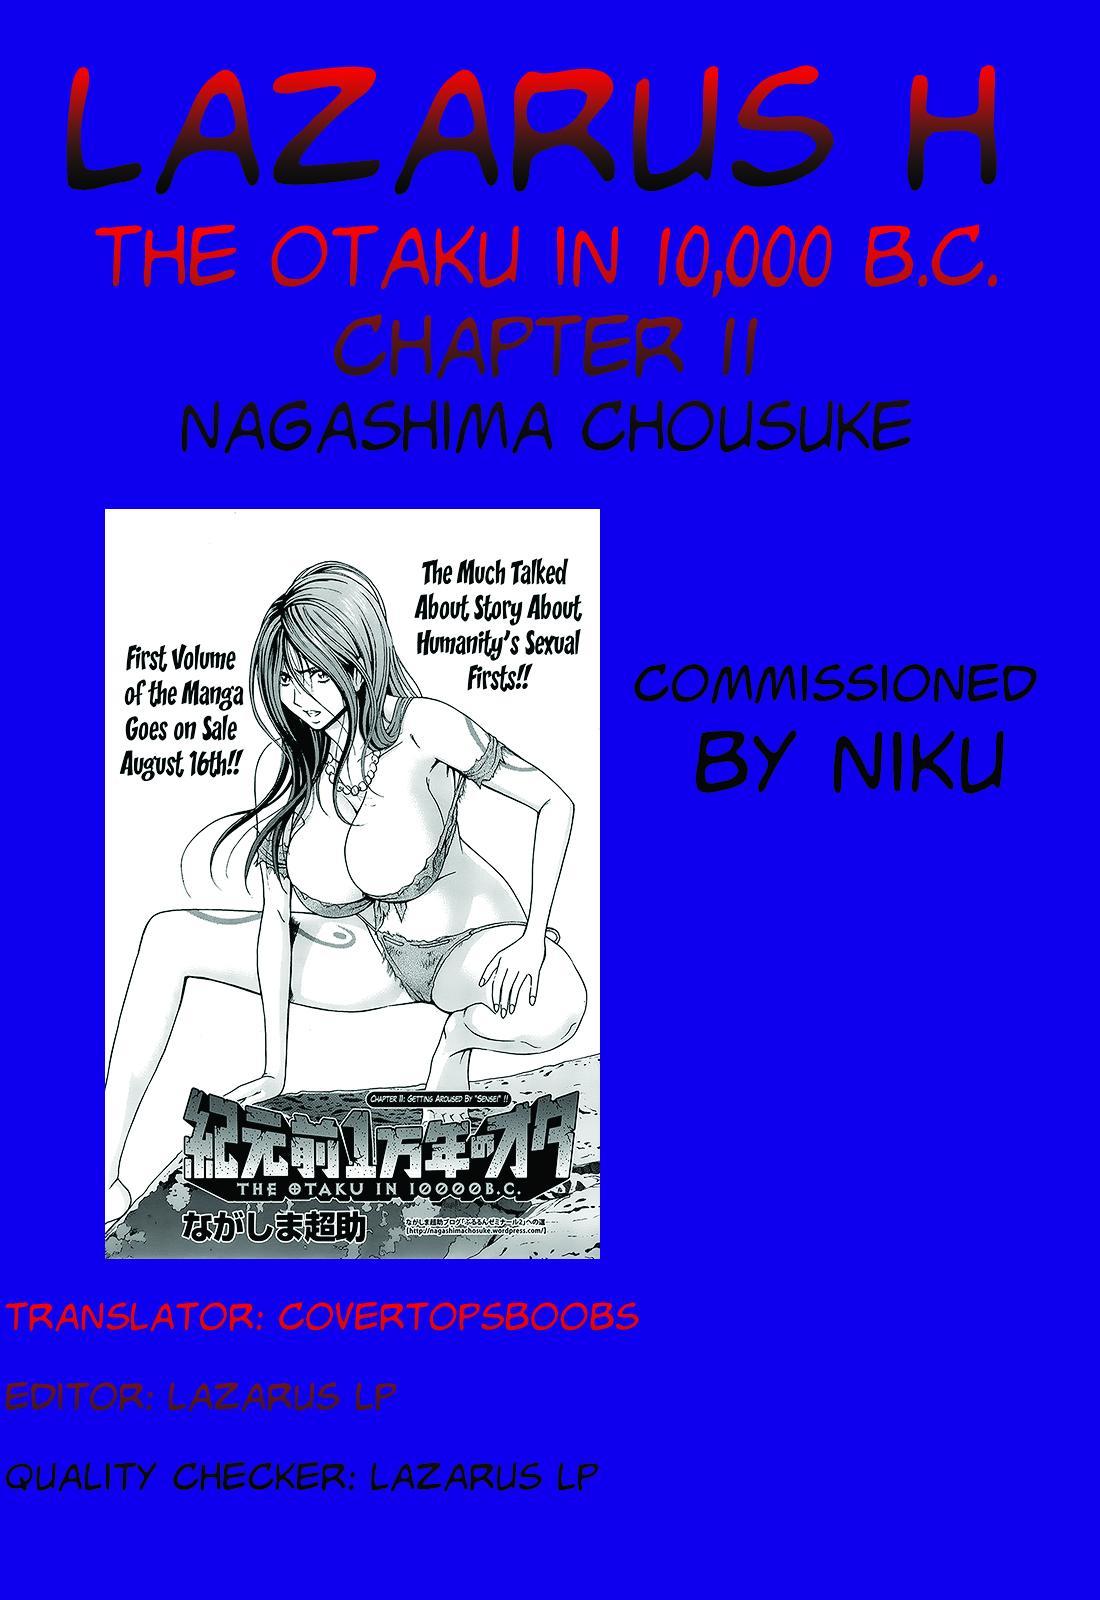 Kigenzen 10000 Nen no Ota   The Otaku in 10,000 B.C. Ch. 1-22 214